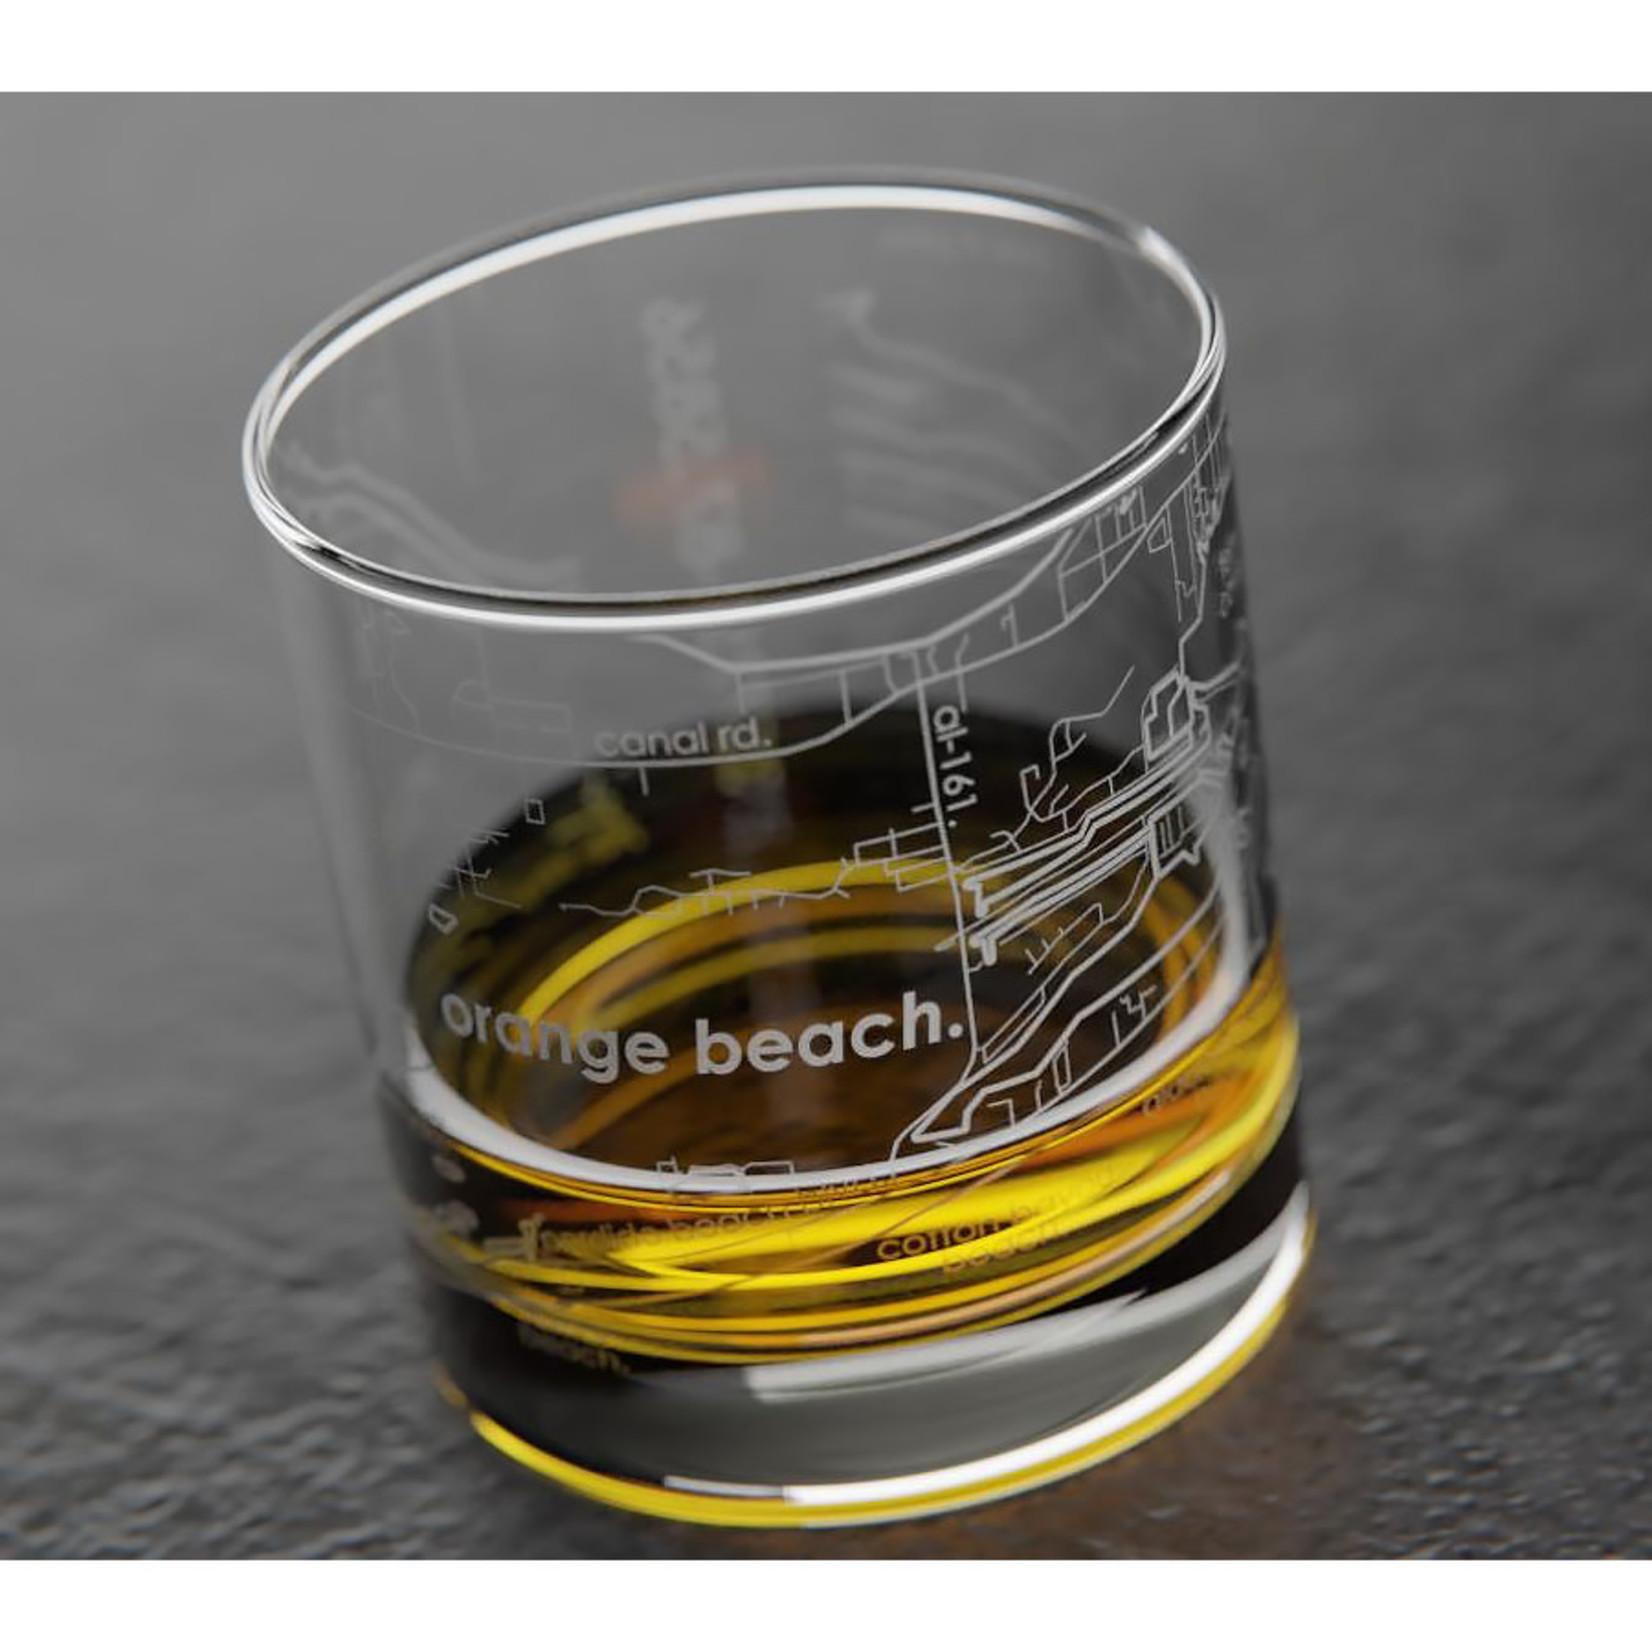 Well Told Orange Beach Map Rocks Glass